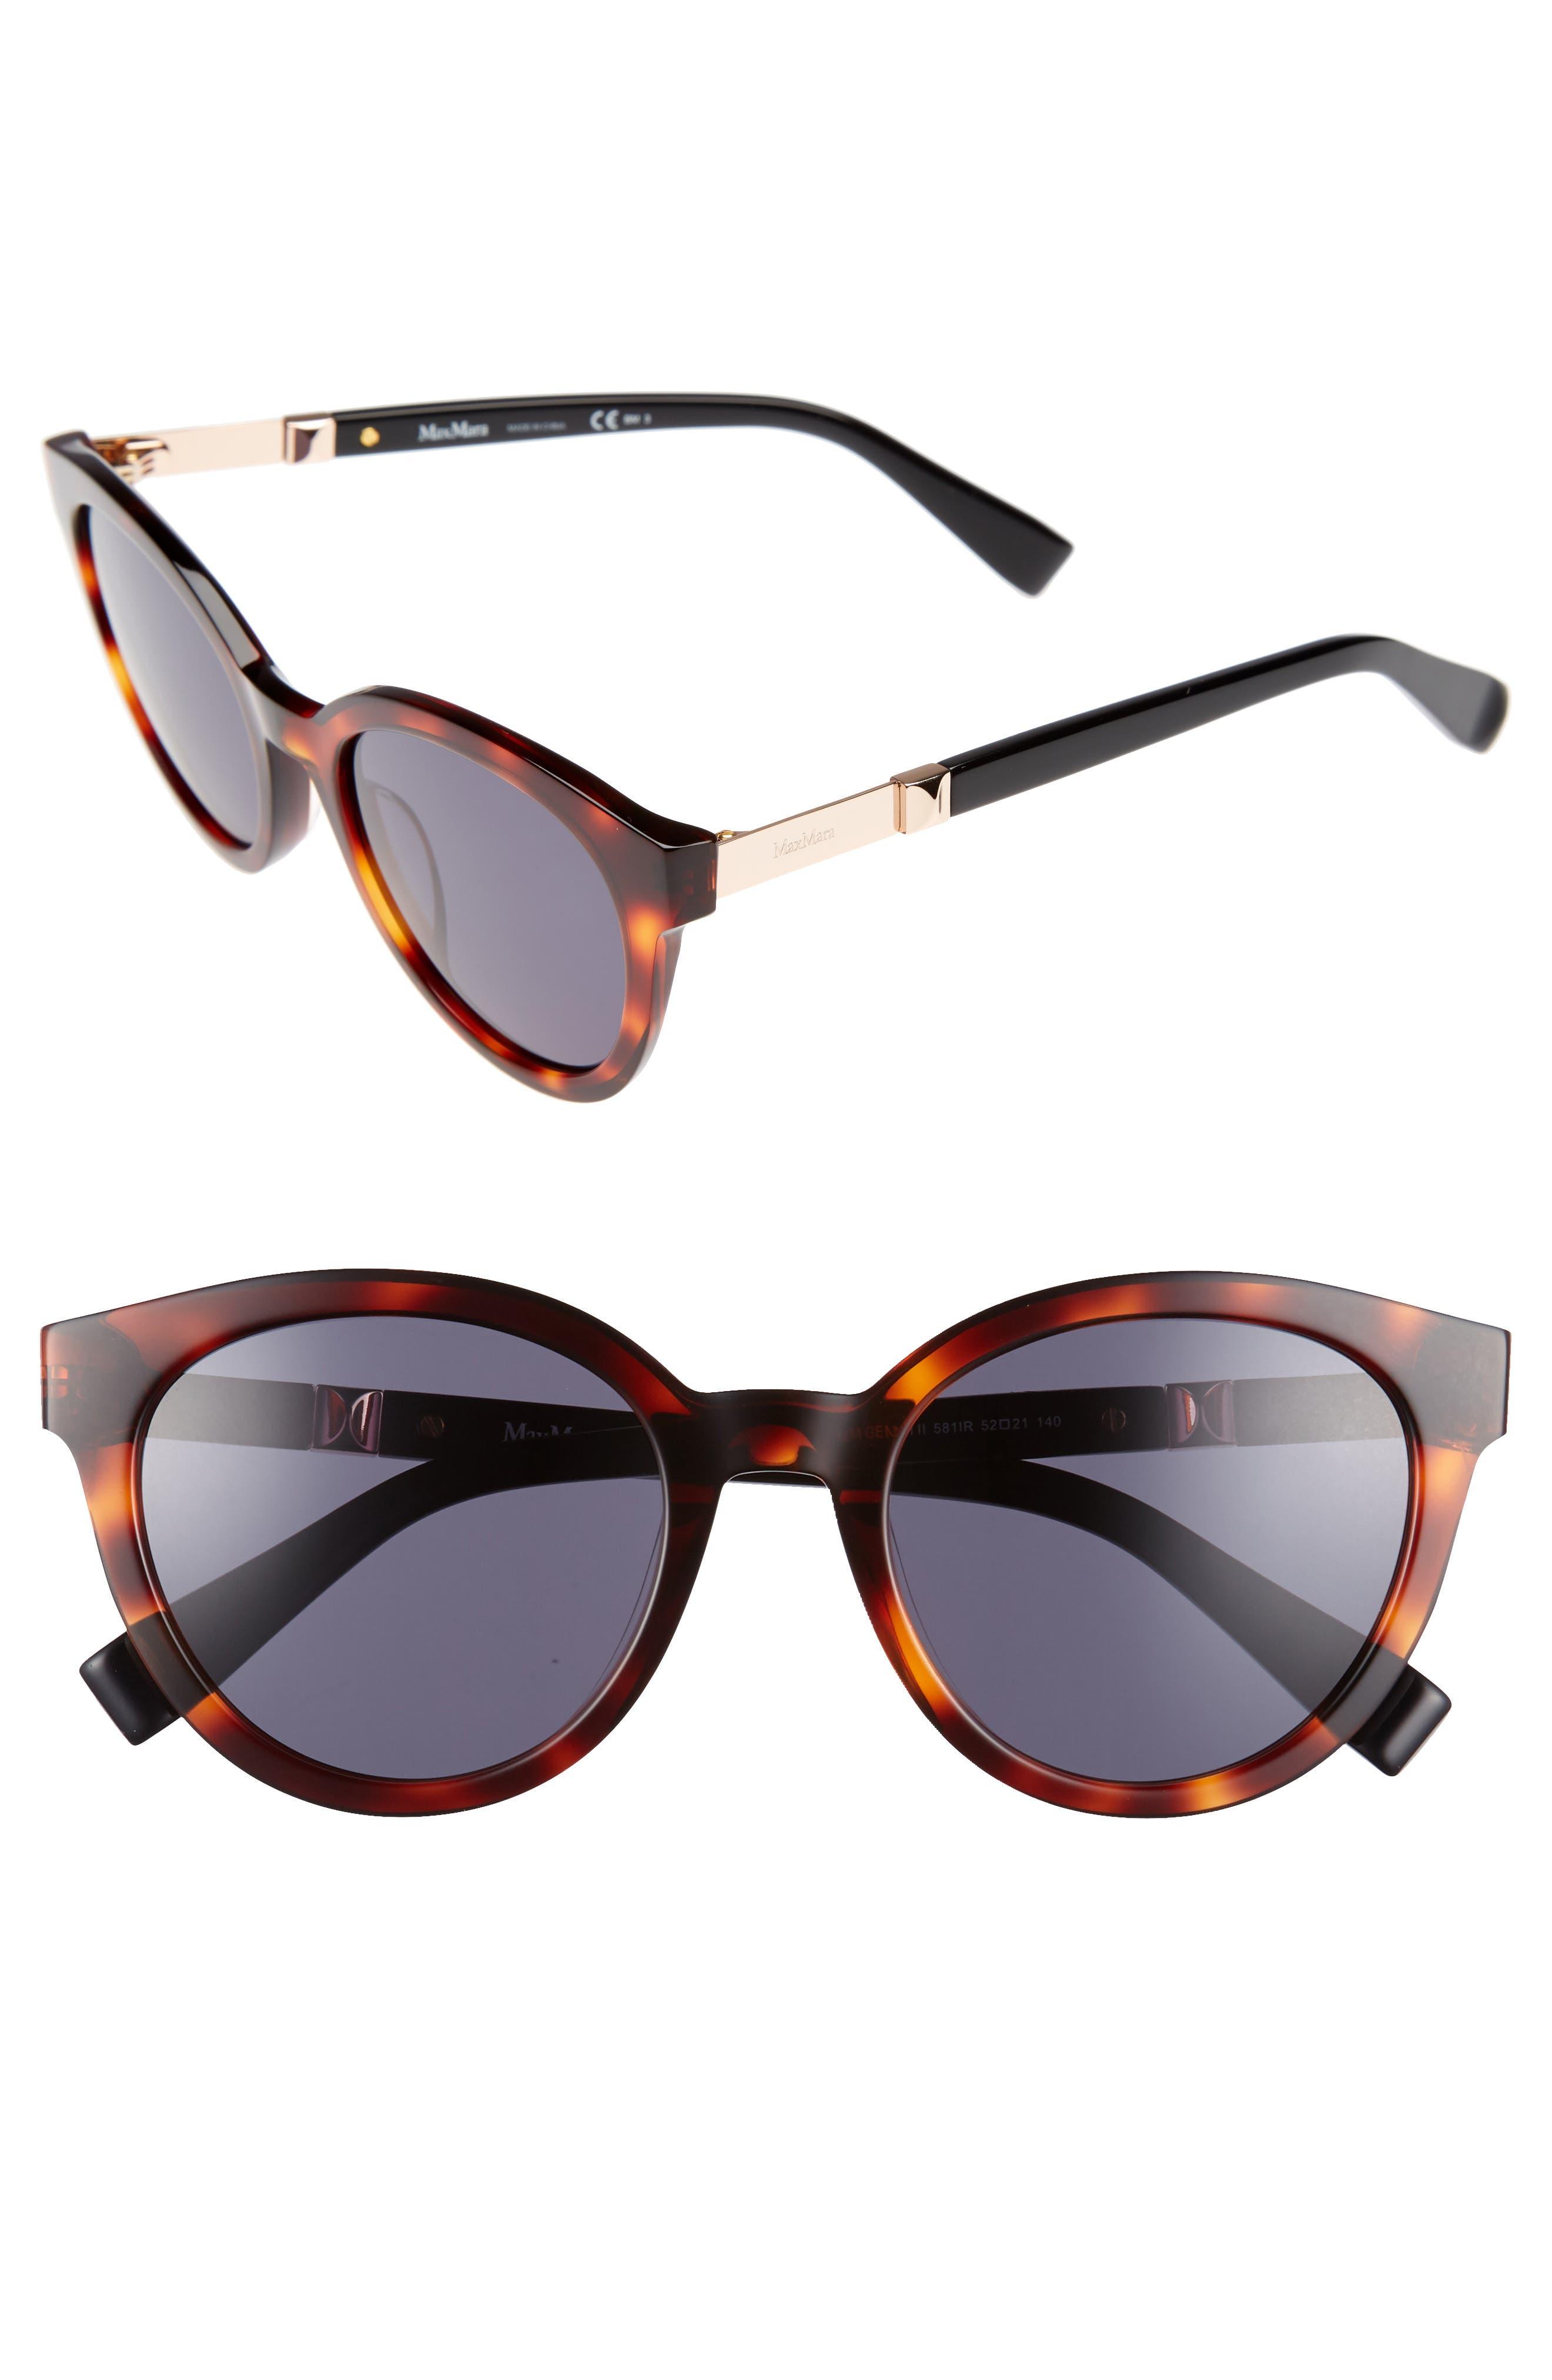 Gemini 52mm Cat Eye Sunglasses,                         Main,                         color, Havana Black